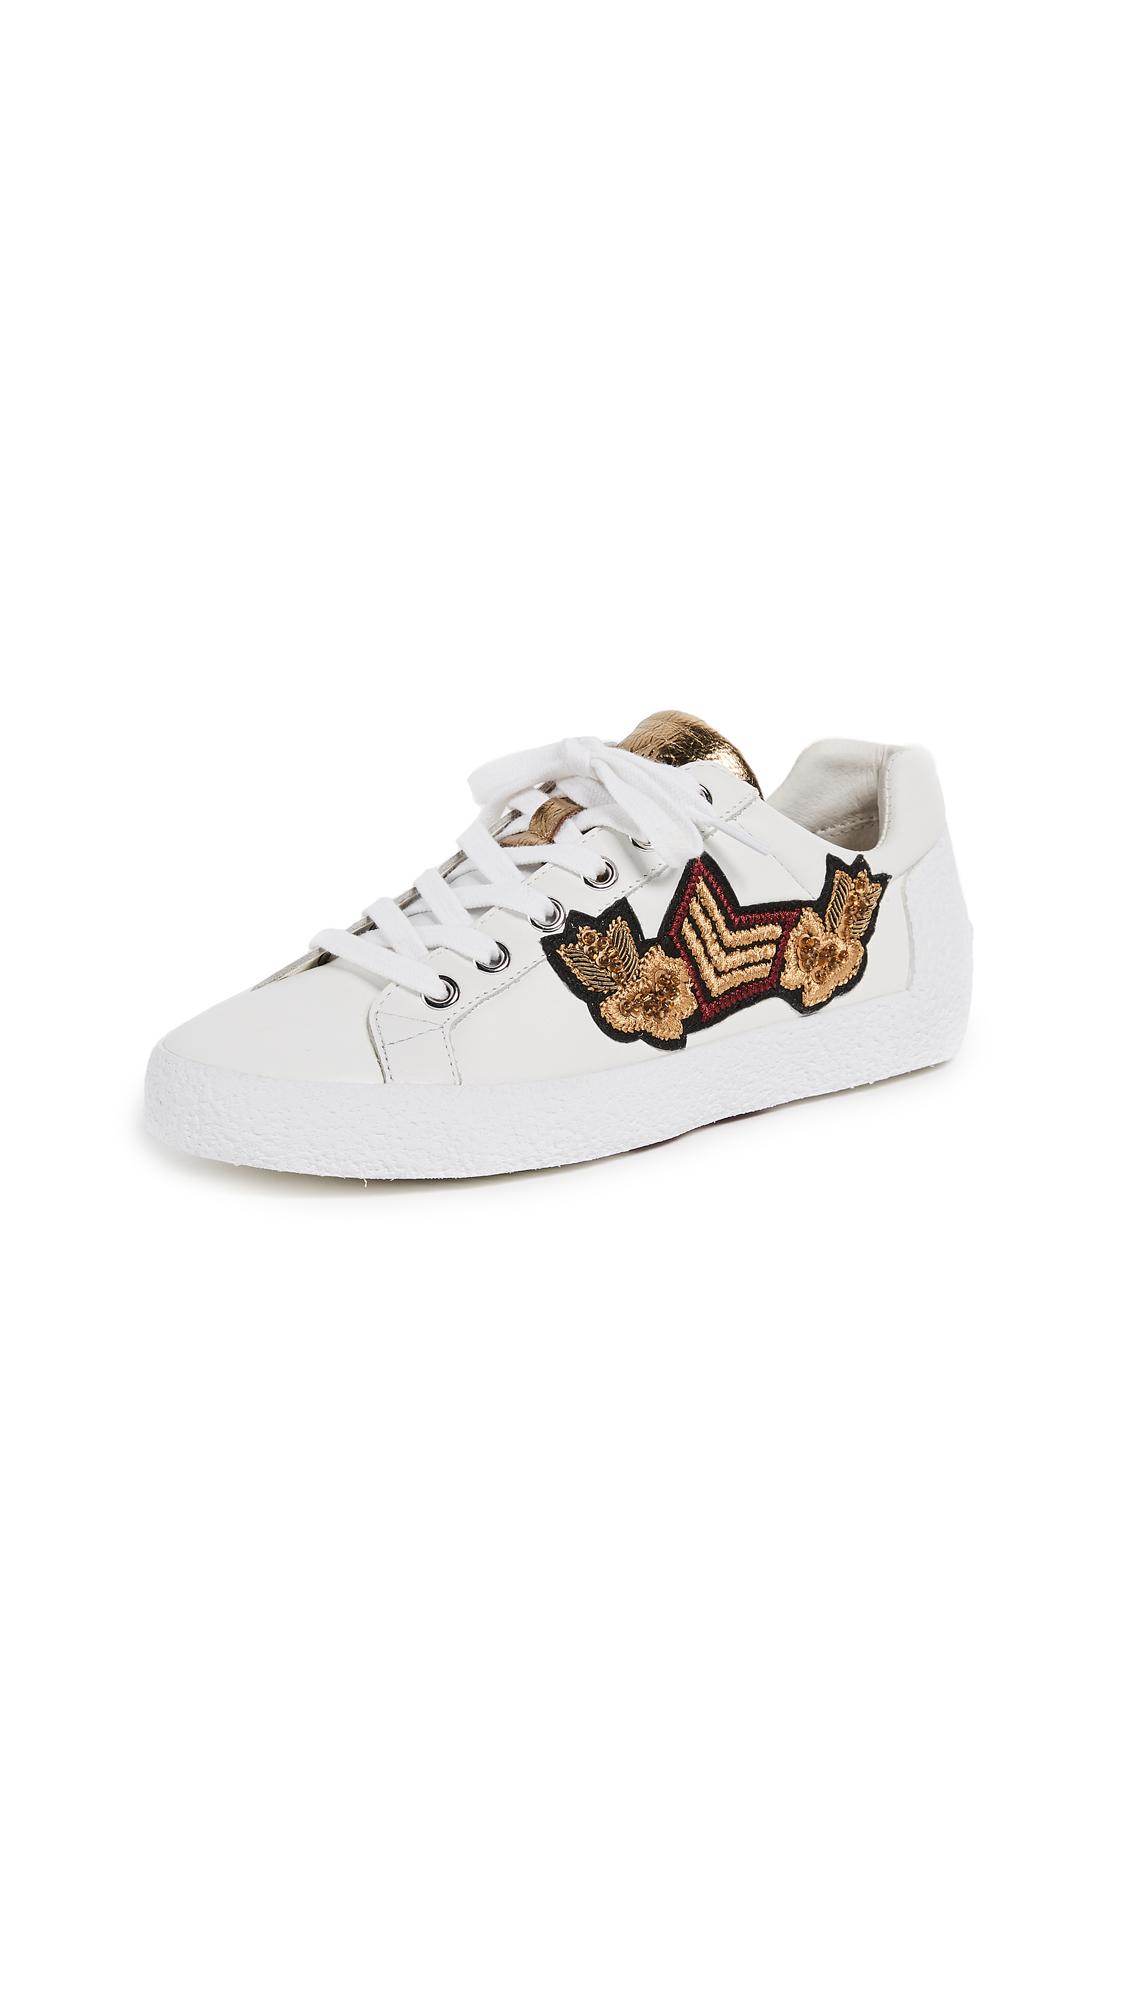 Ash Nak Arms Sneakers - White